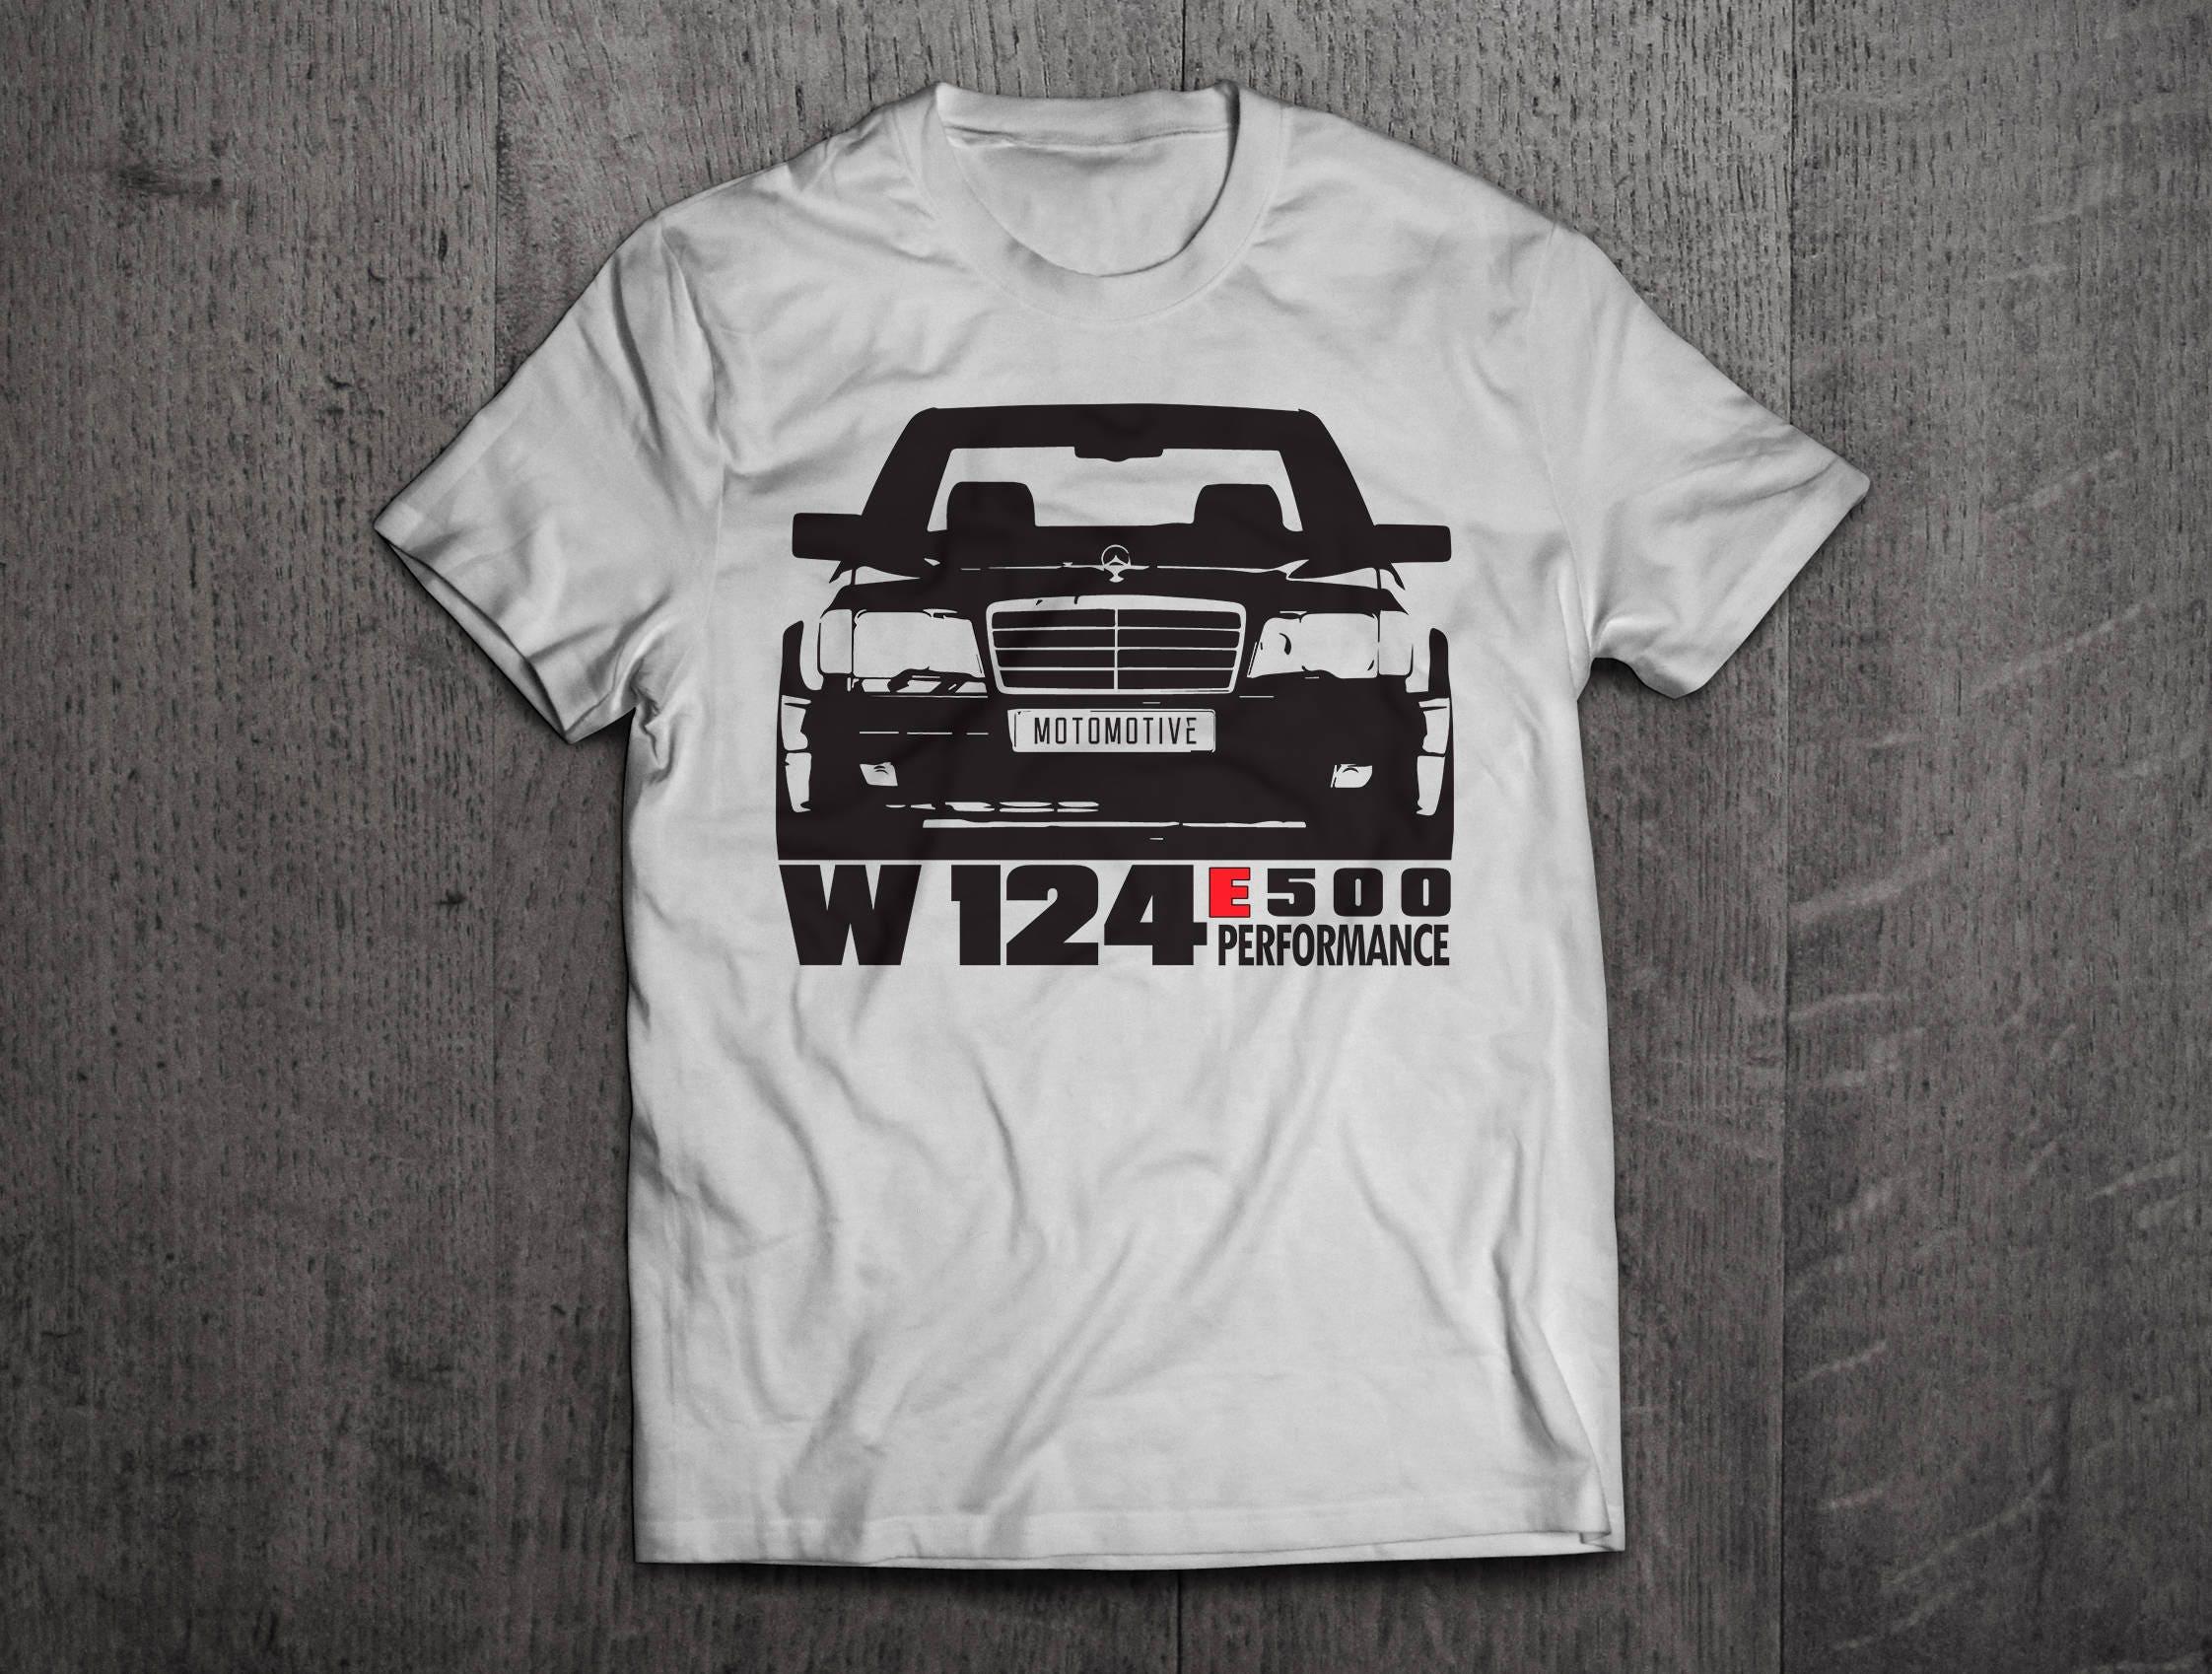 mercedes w 124 shirts mercdes t shirts benz shirts cars. Black Bedroom Furniture Sets. Home Design Ideas